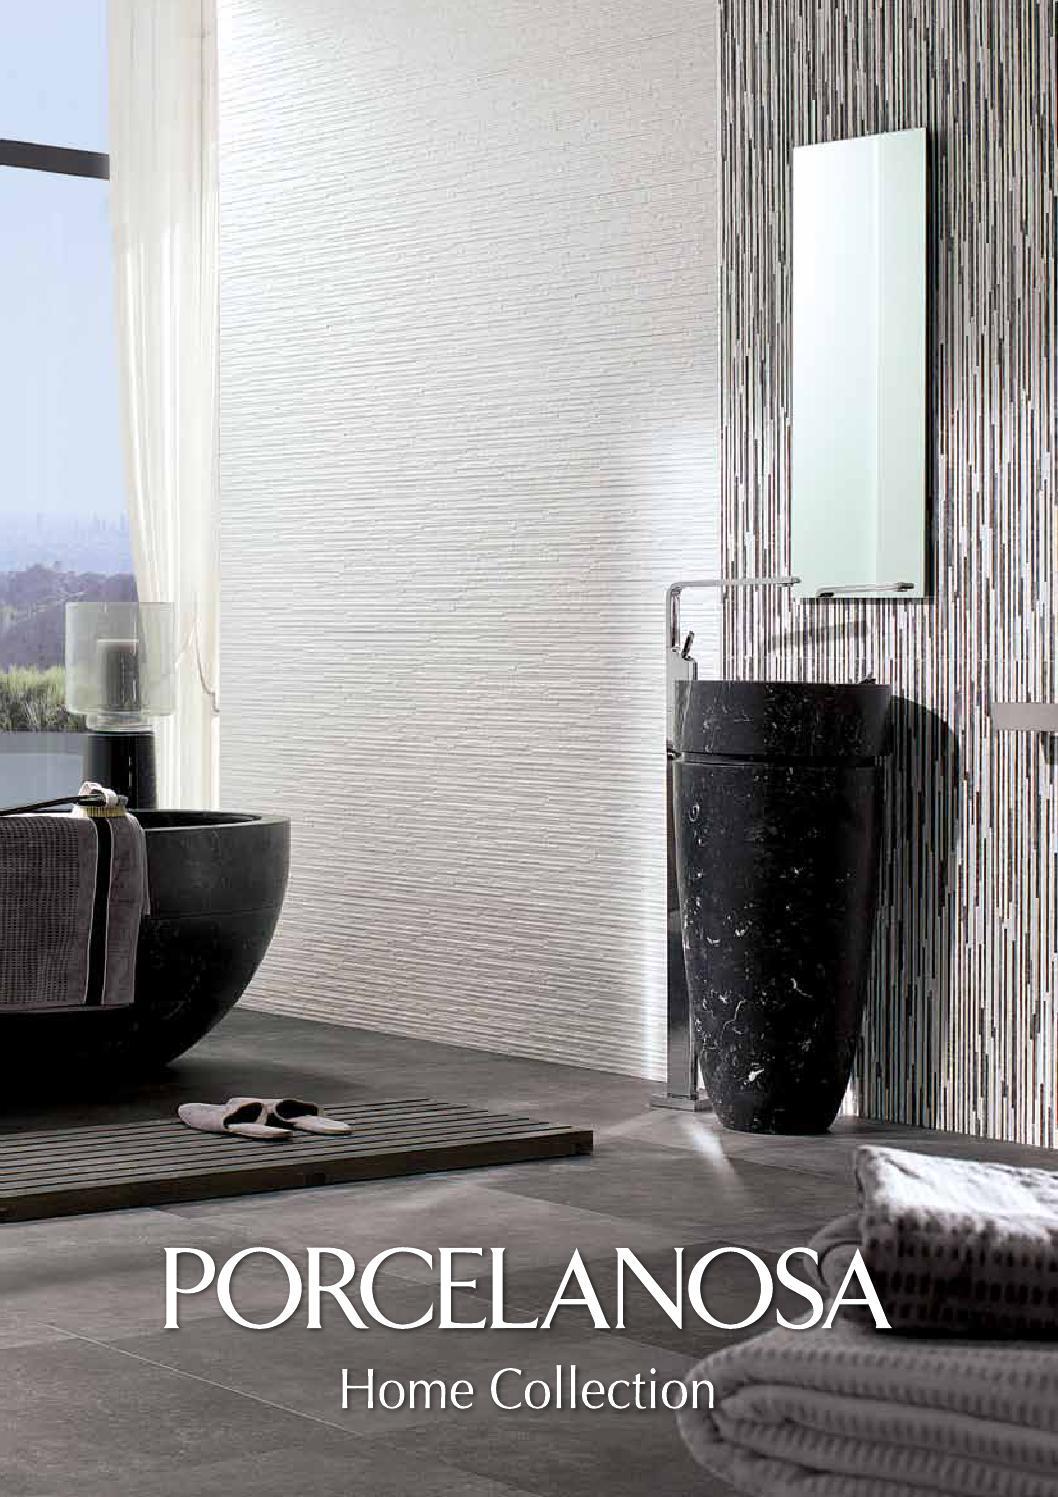 Catalogo porcelanosa 2014 by issuu - Catalogo banos porcelanosa ...